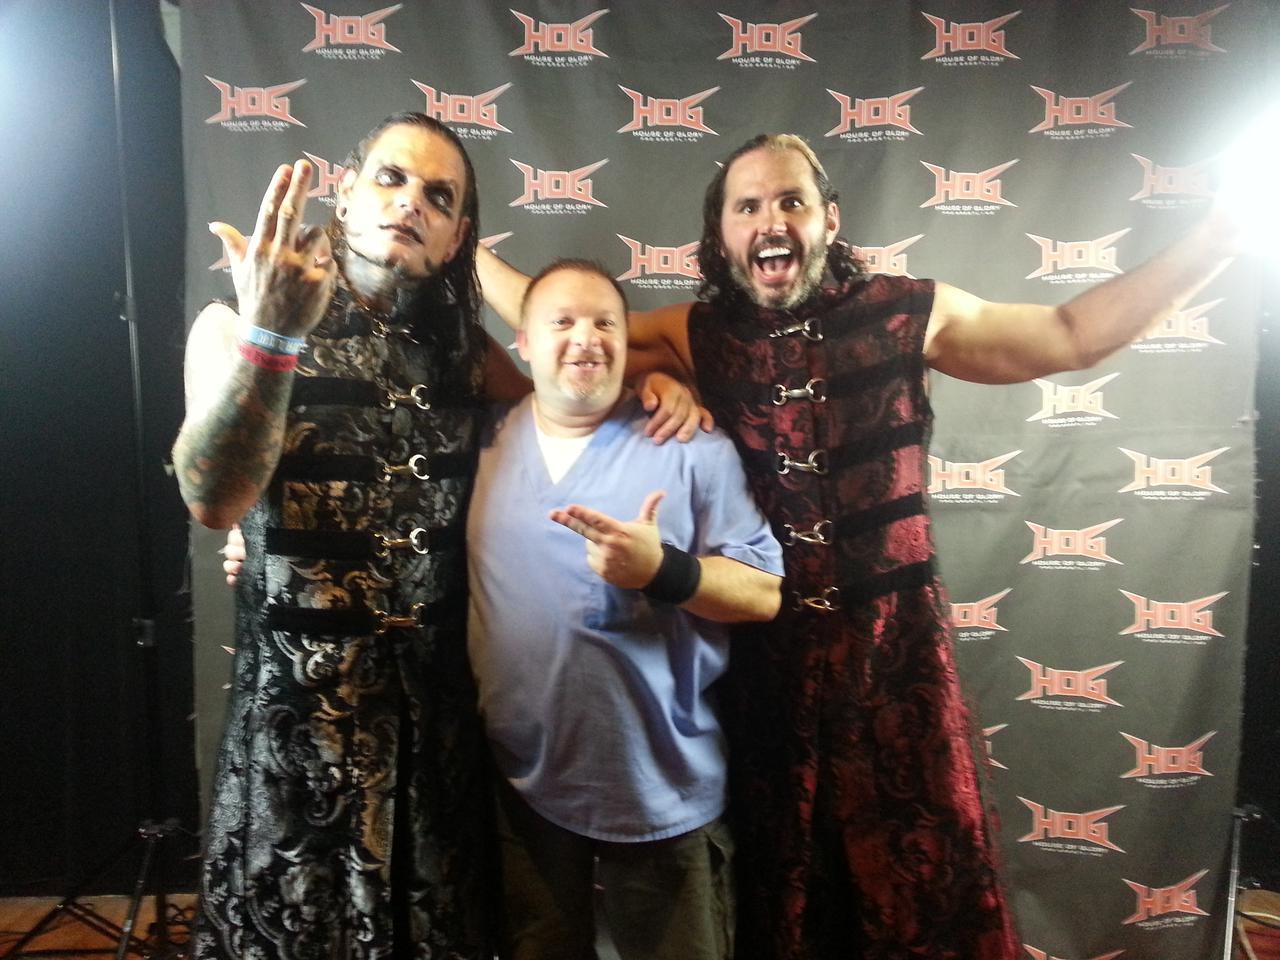 Jeff & Matt Hardy with Jim